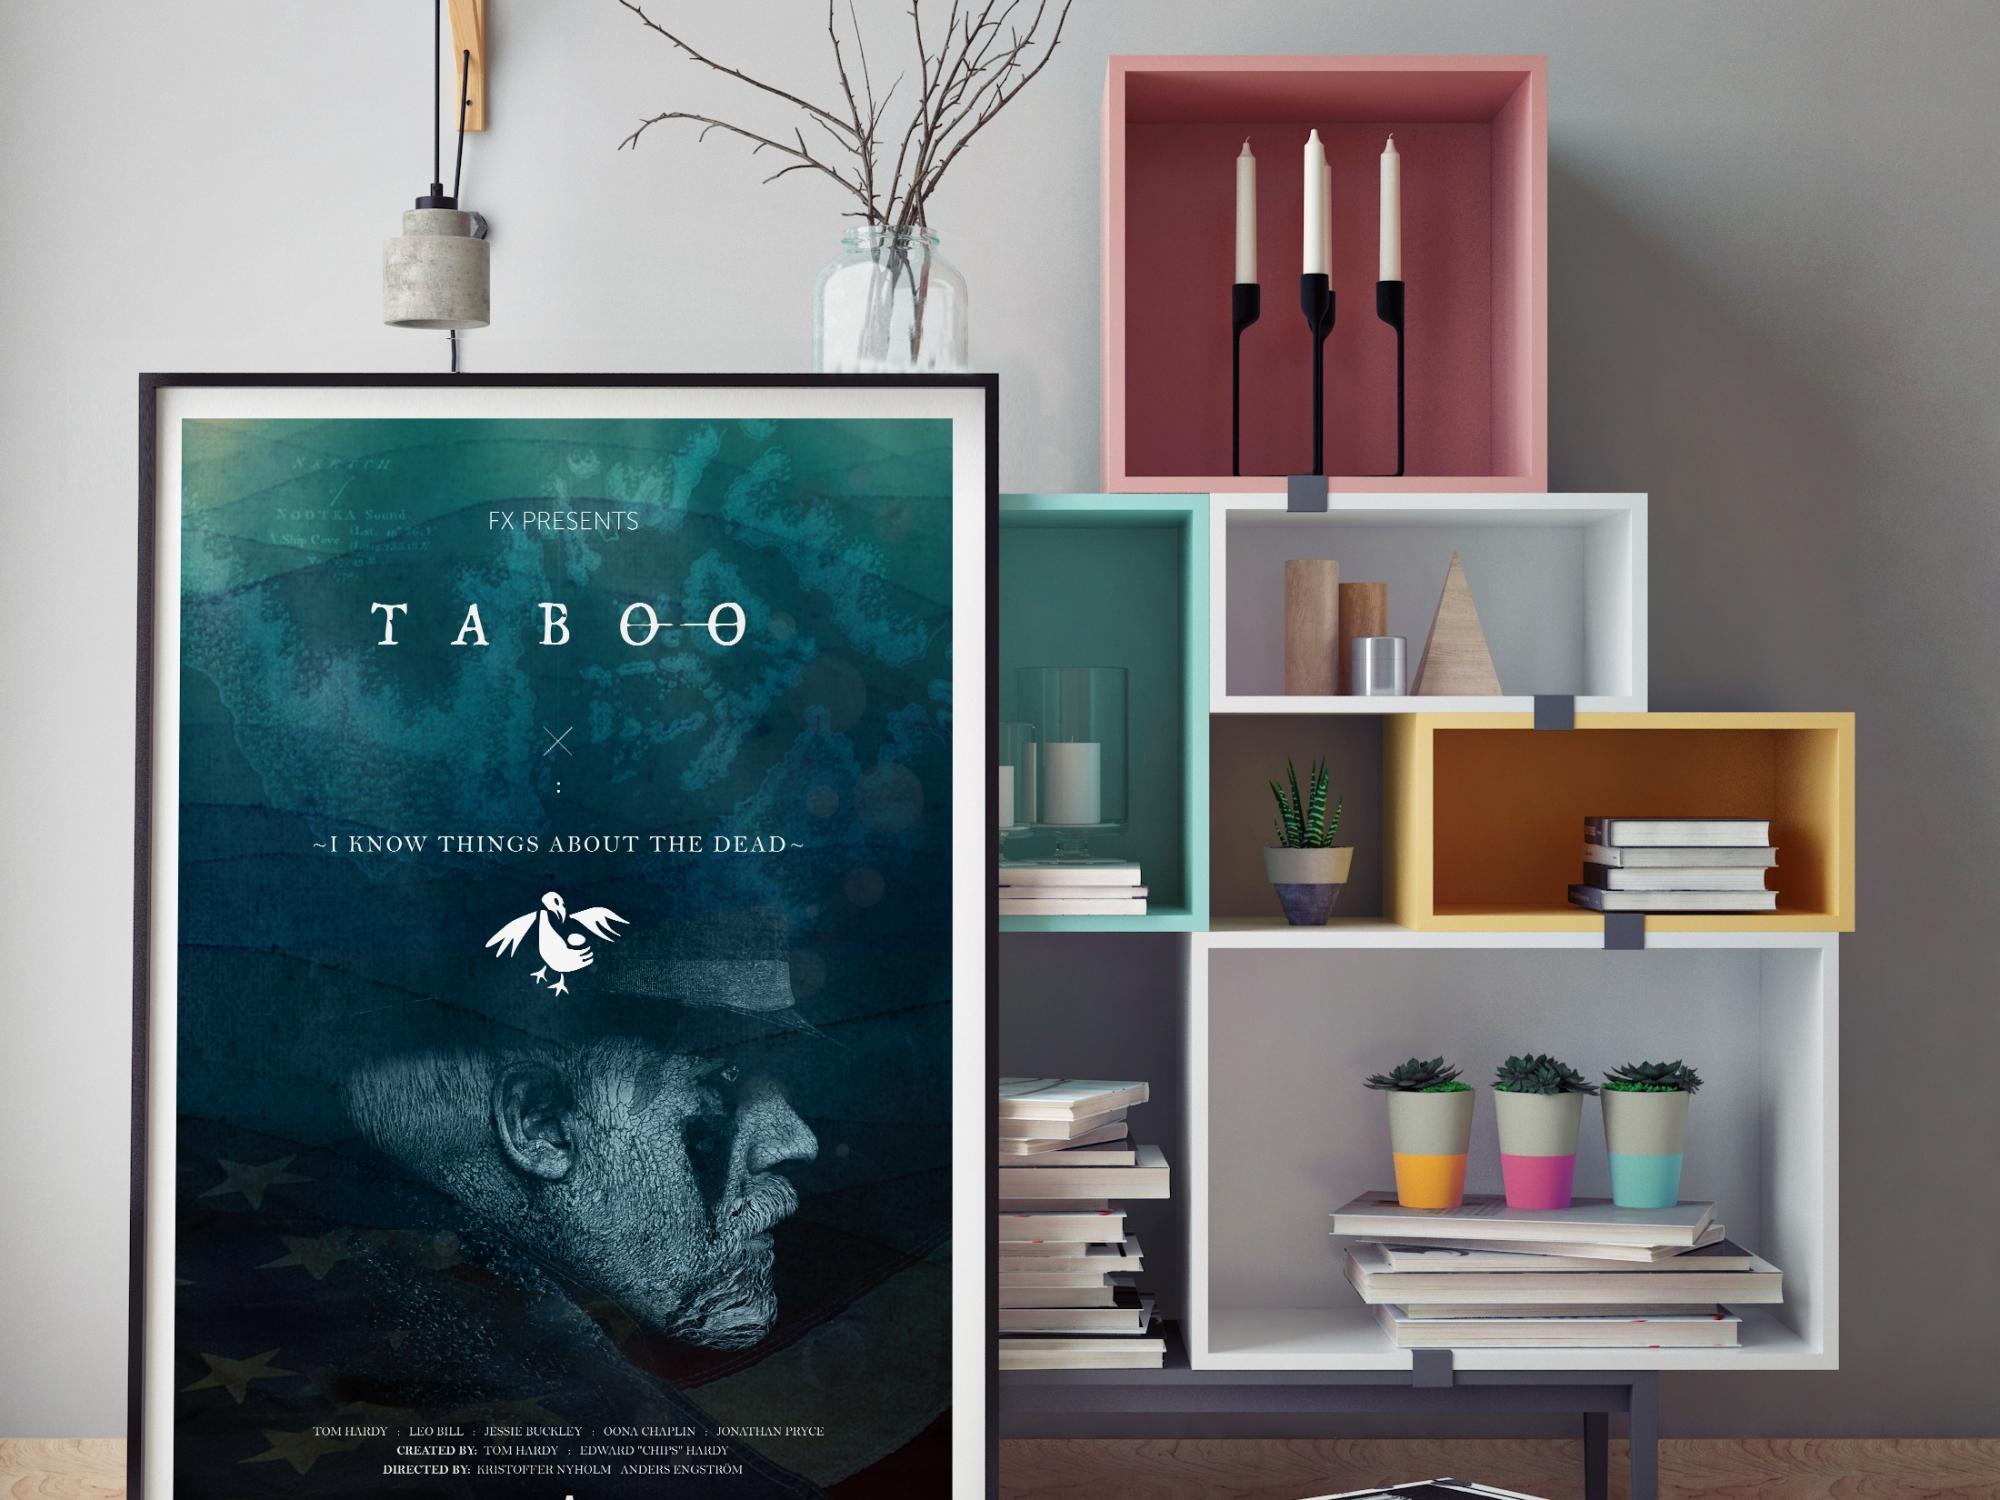 Taboo TV Series Poster Design